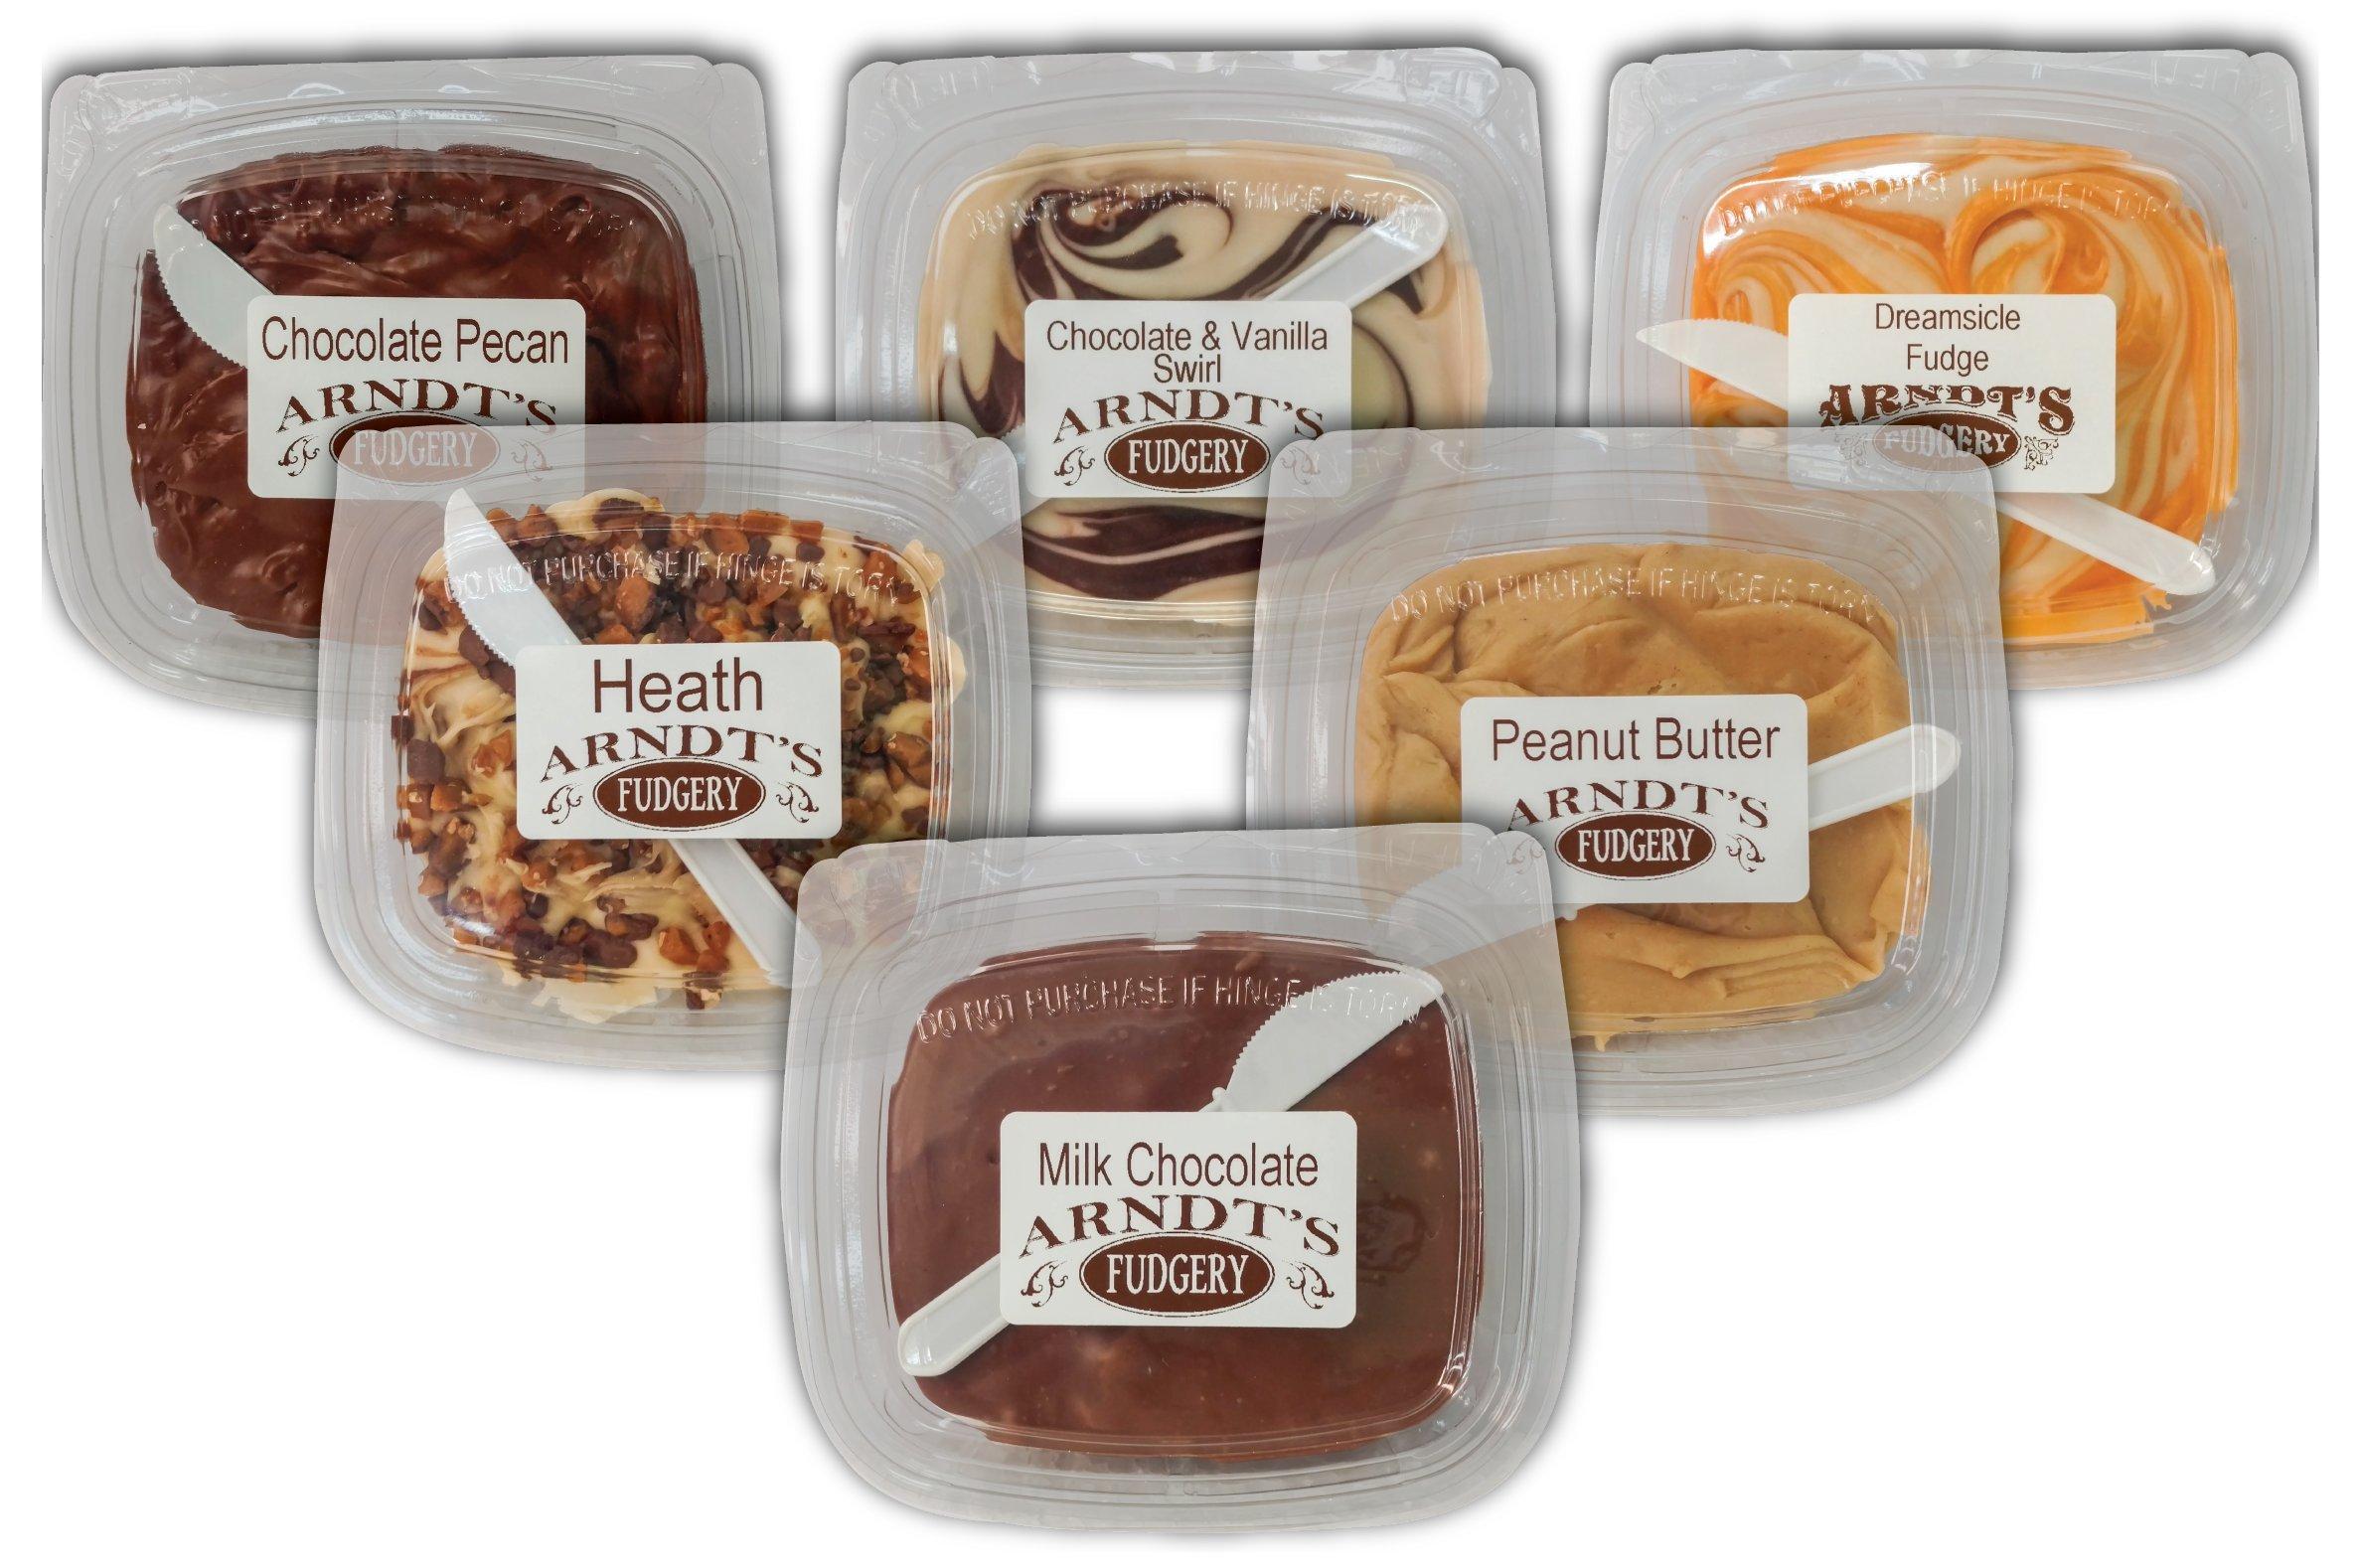 7 Oz Tubs Of Fudge (Six 7 Oz Tubs Of Fudge - Six Great Flavors)